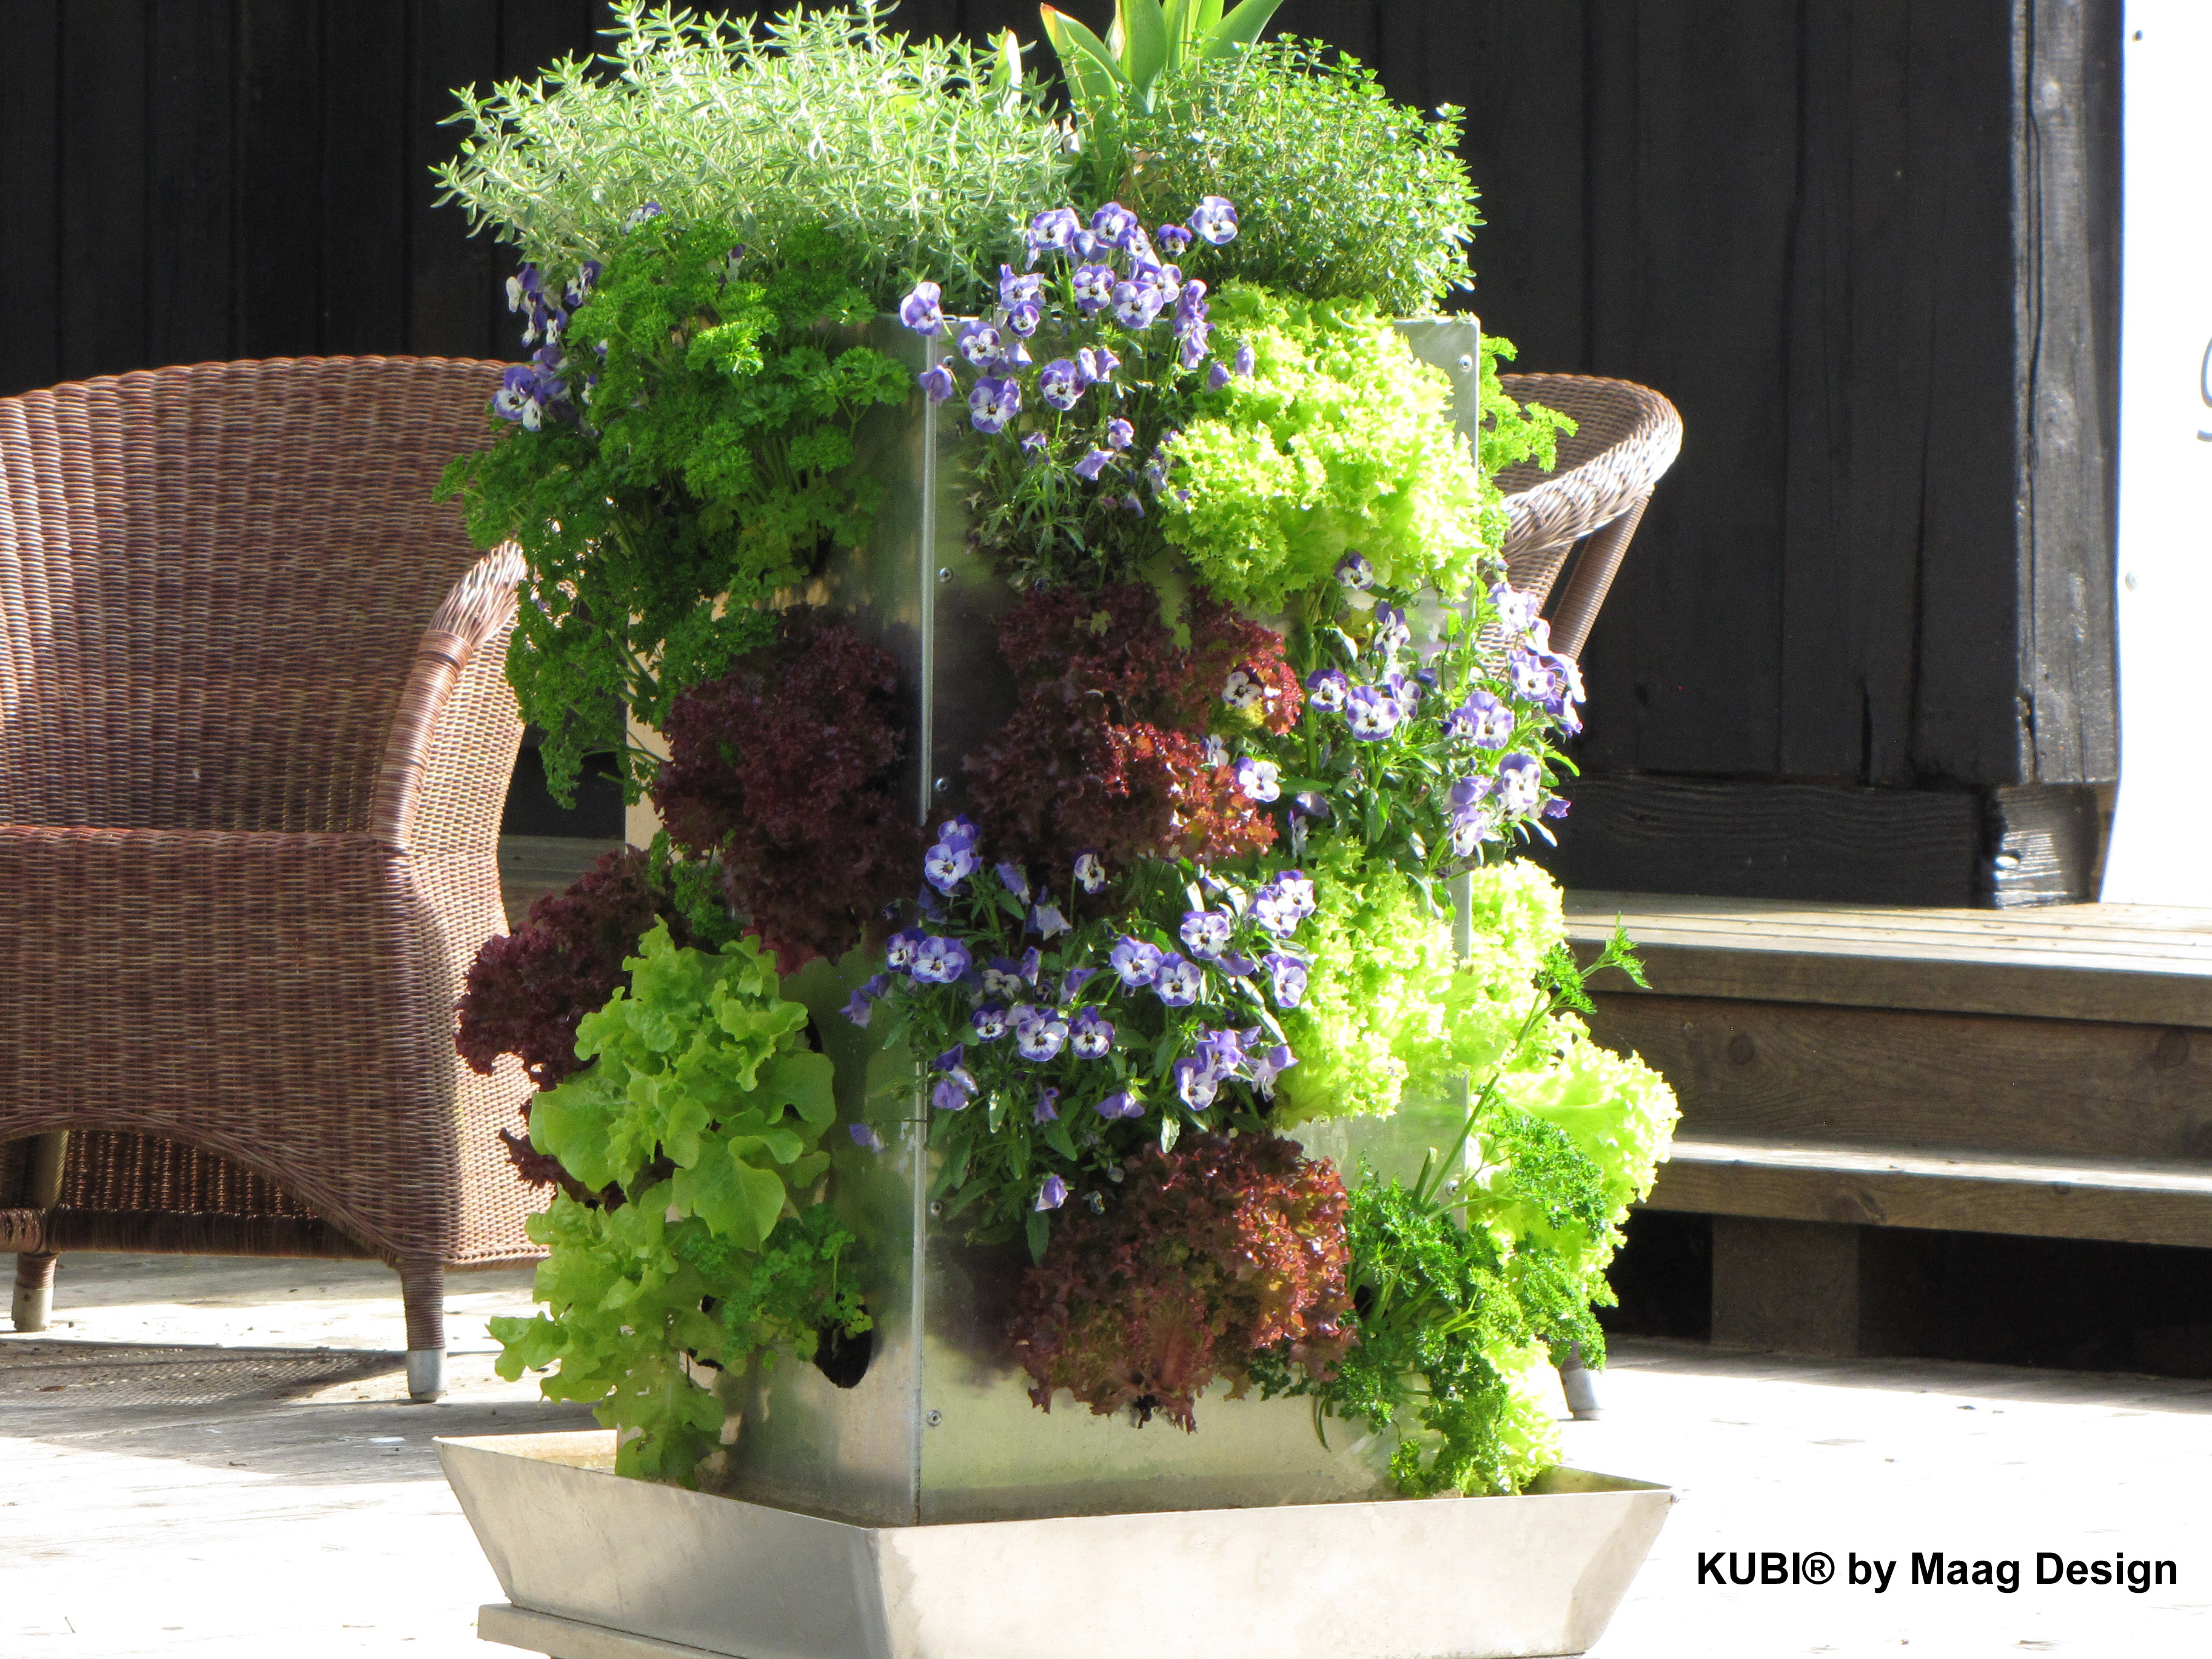 groe pflanzen fr die terrasse hohe schmale pflanzen vor cm groe sonstiges fr den garten balkon. Black Bedroom Furniture Sets. Home Design Ideas